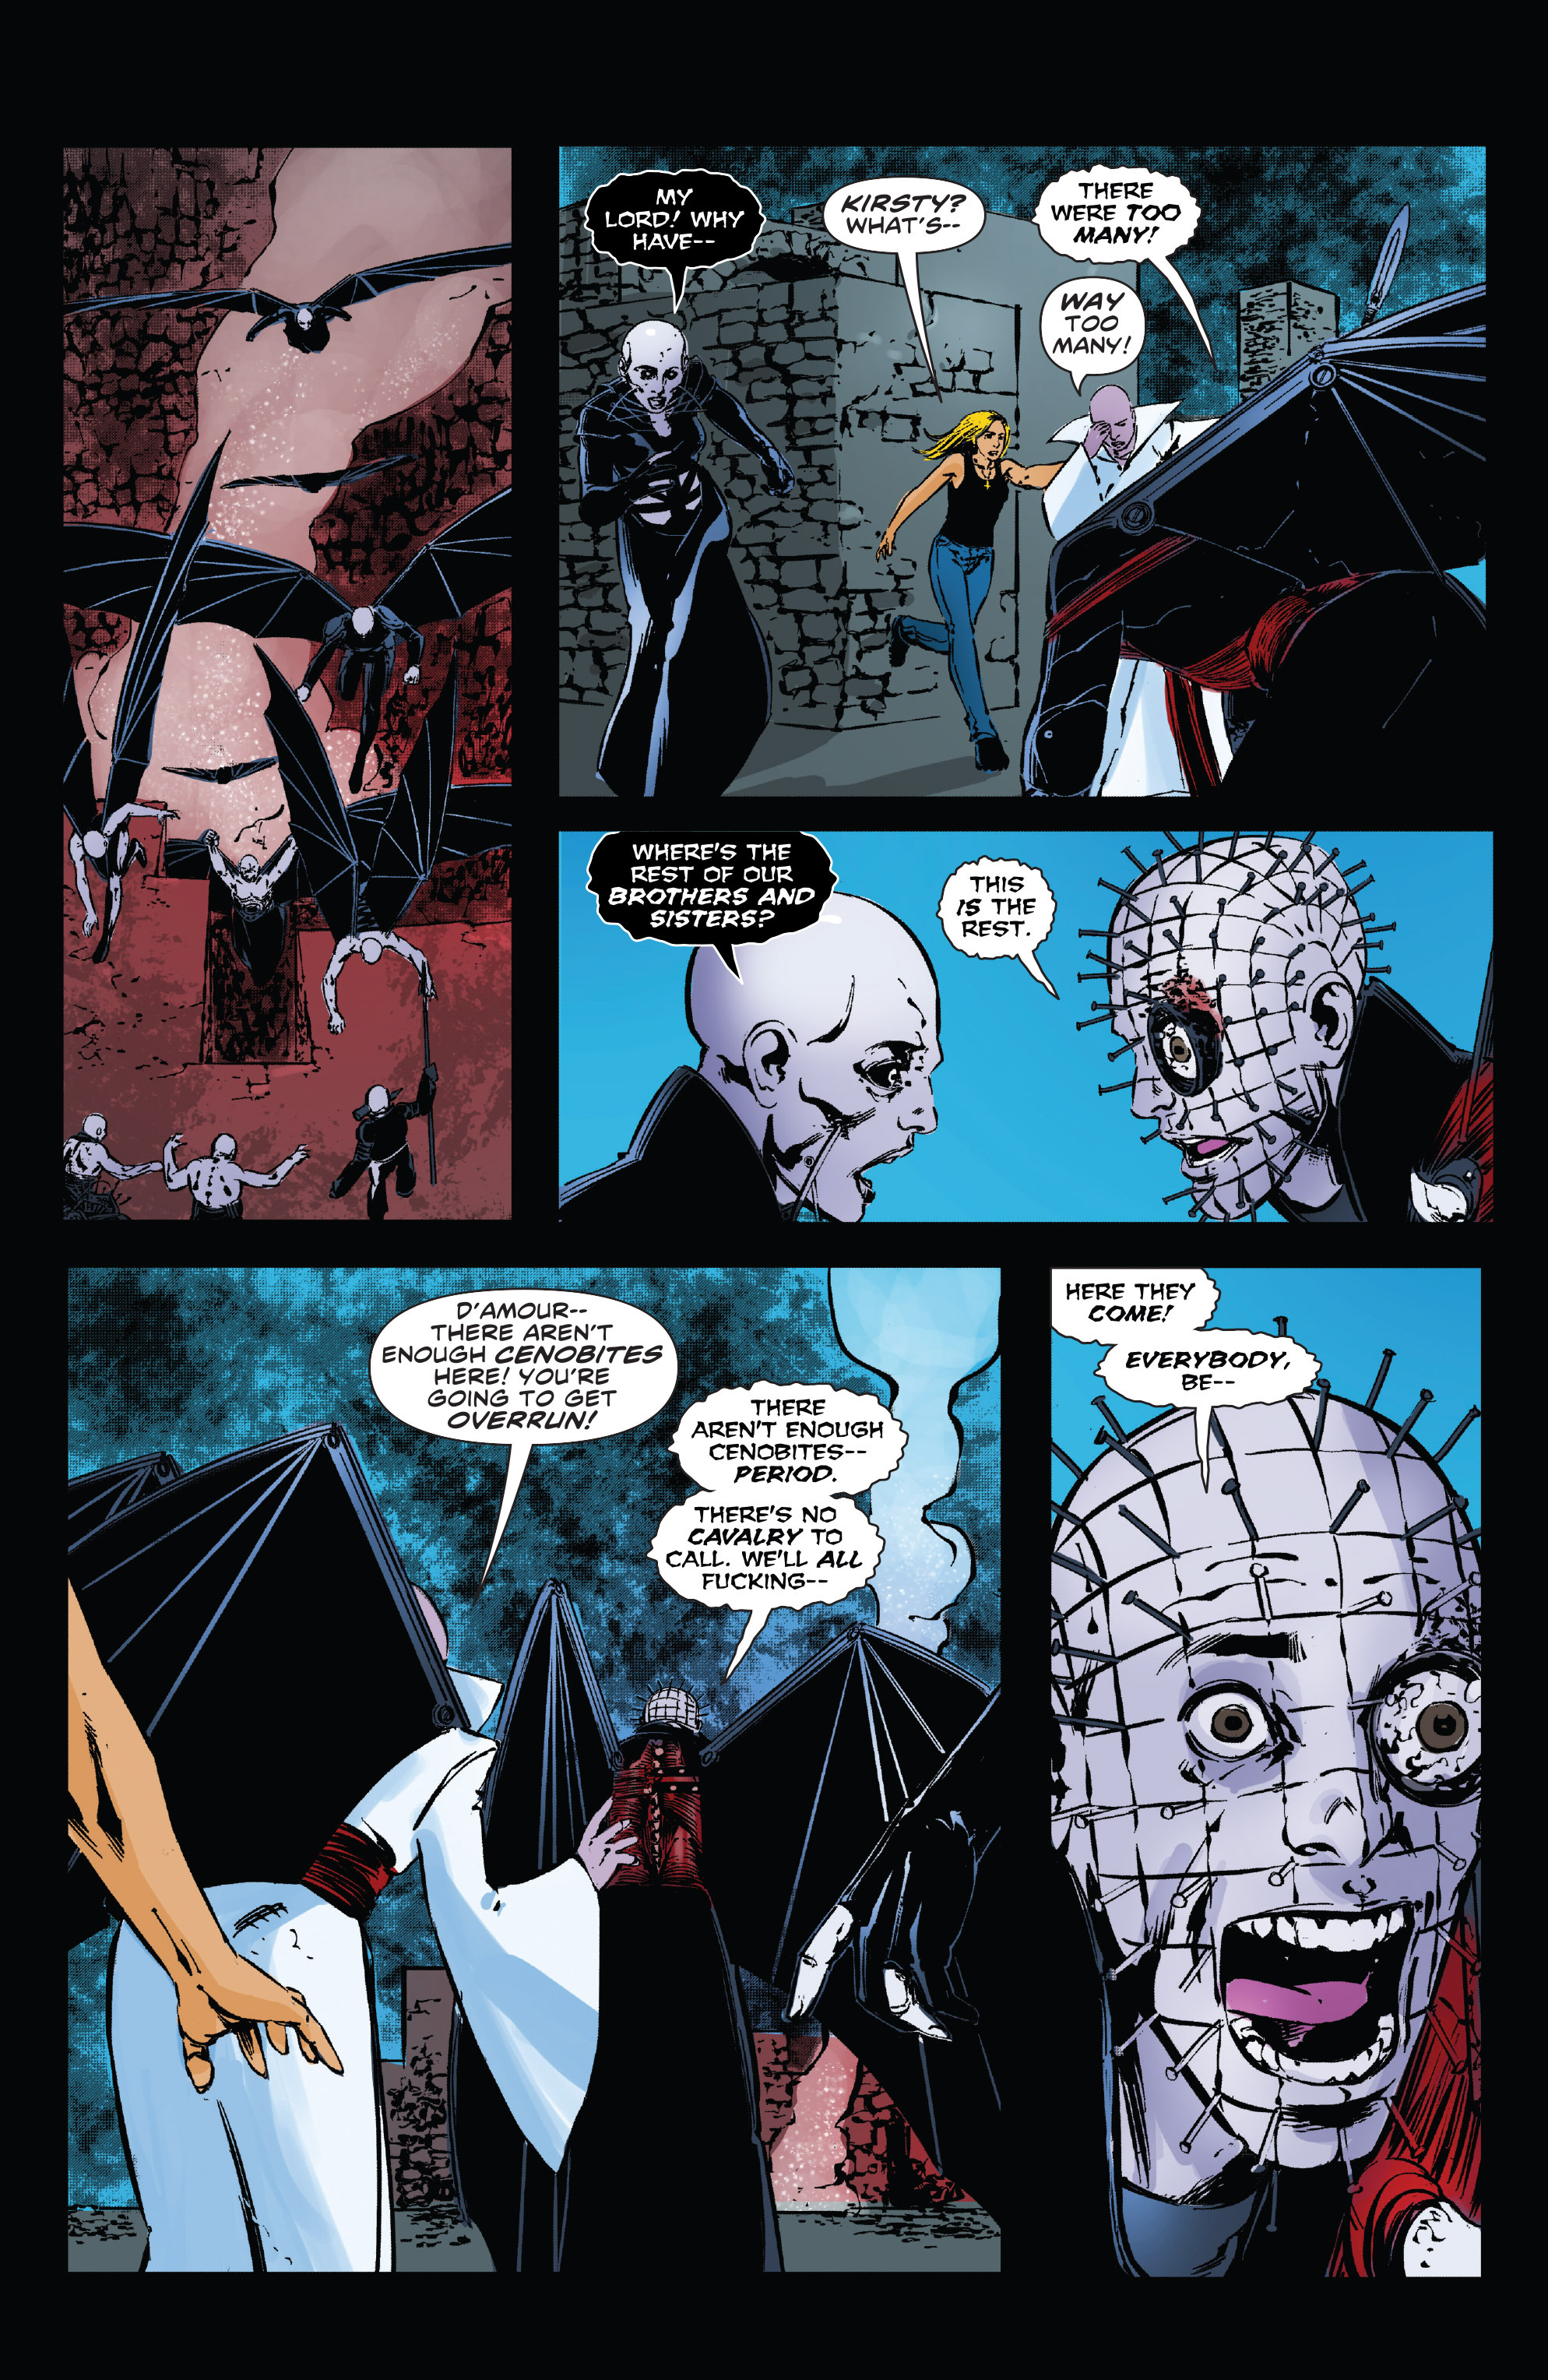 Read online Clive Barker's Hellraiser: The Dark Watch comic -  Issue # TPB 3 - 78